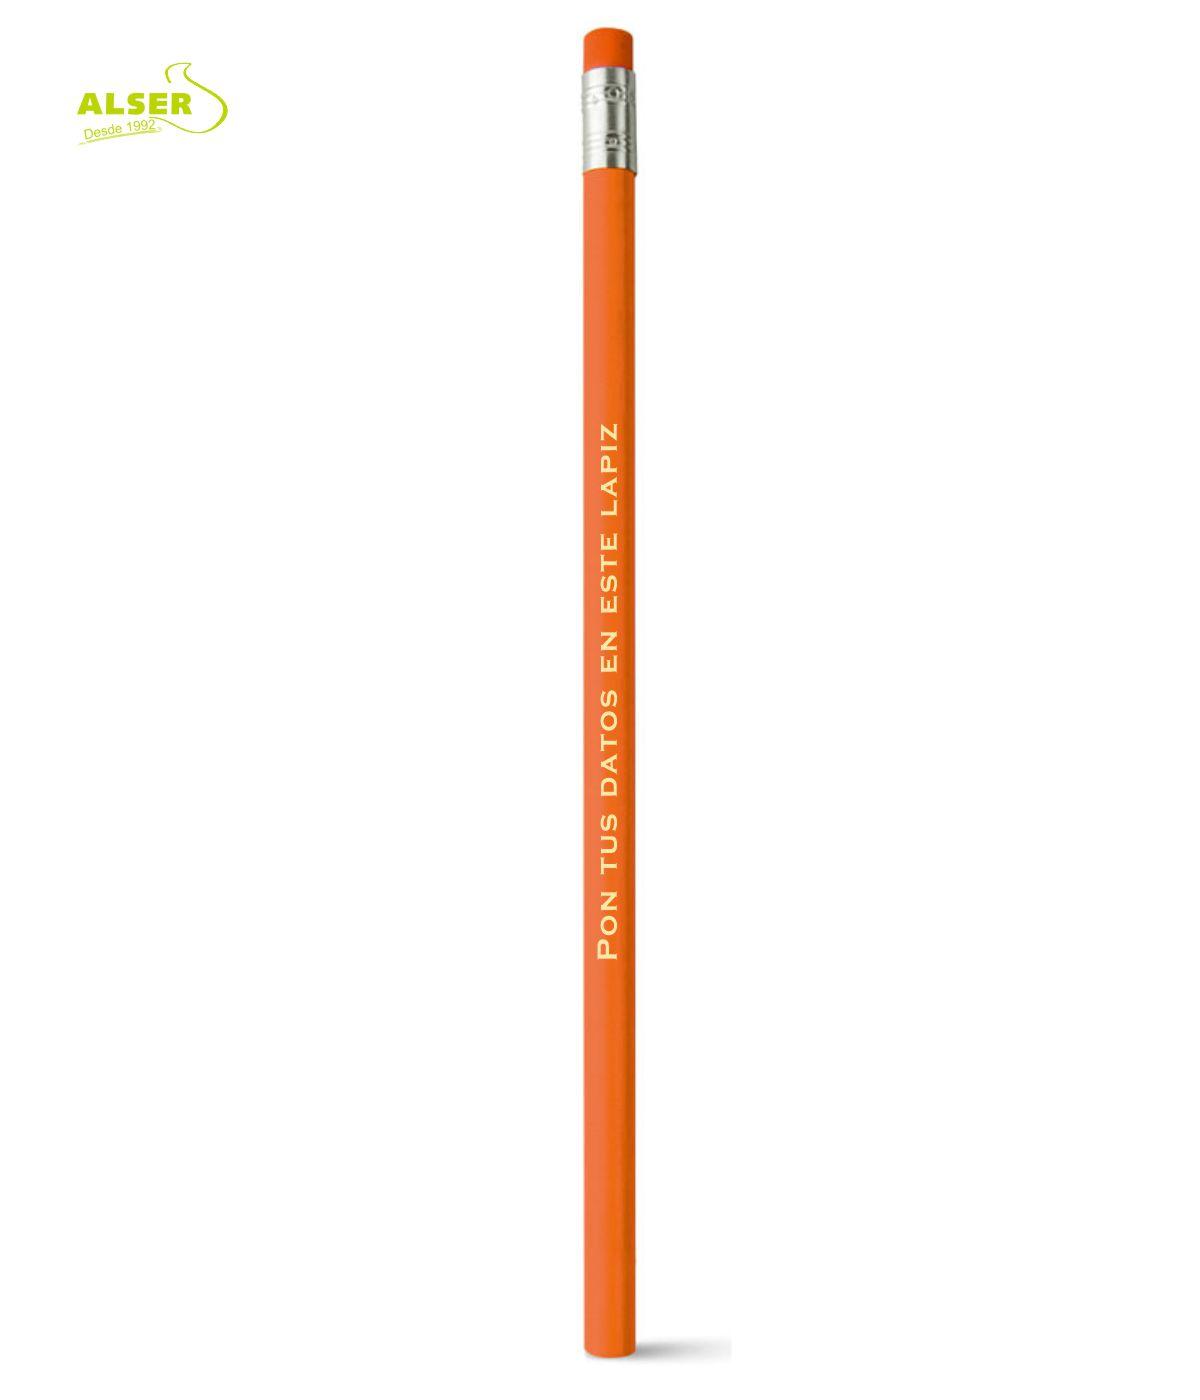 Lapiz publicitario para personalizar Naranja